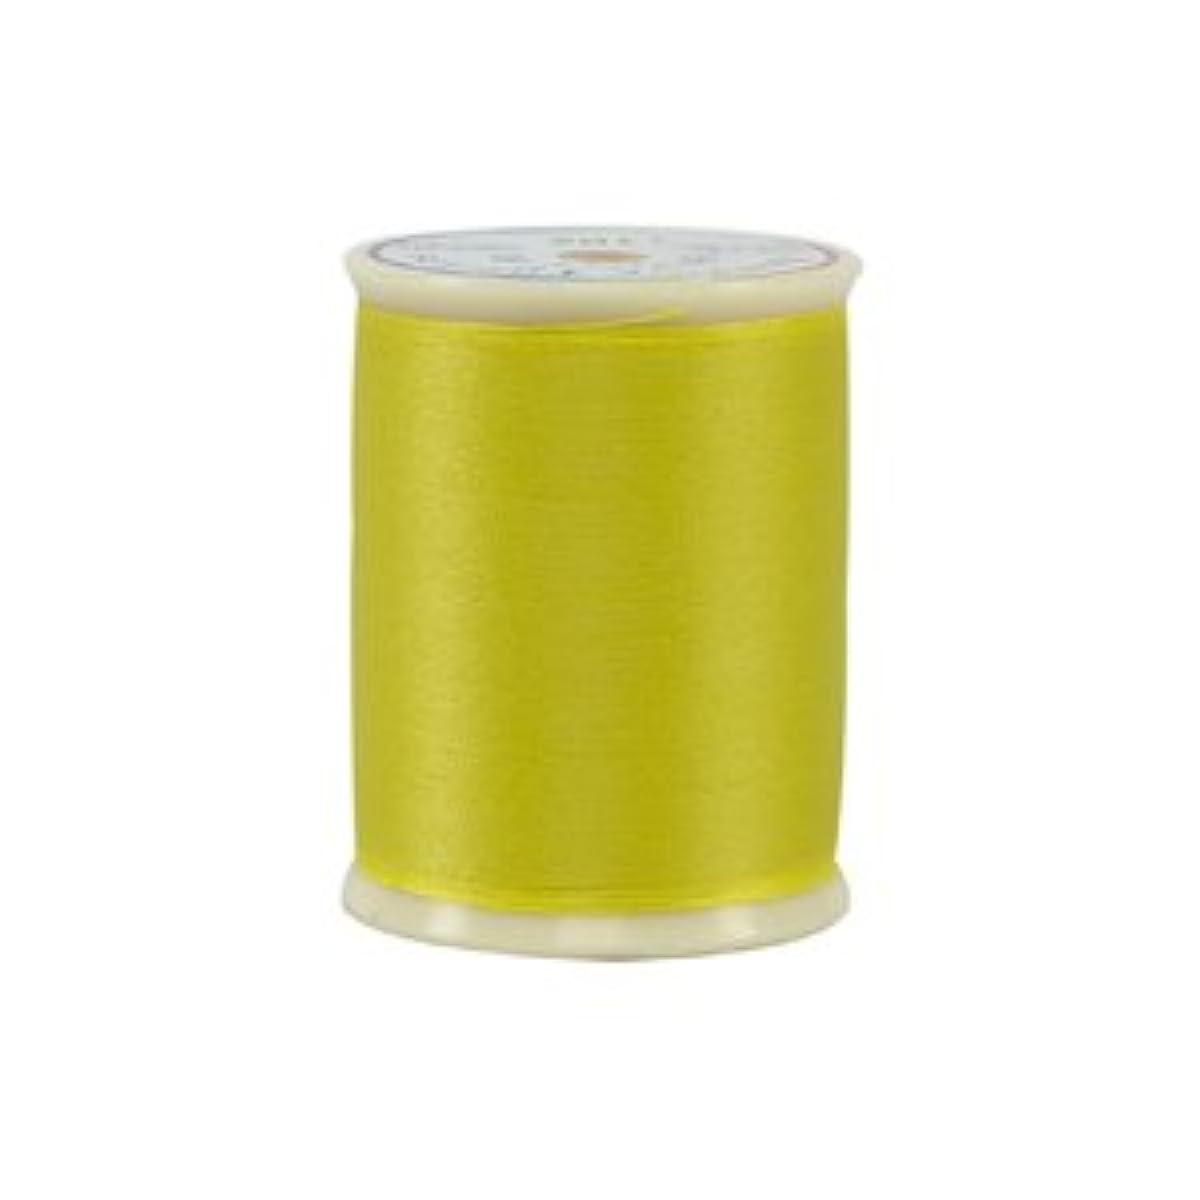 Superior Threads 12501-1102 Sew Fine Yellow Submarine 3-Ply 30W Polyester Thread, 275 yd